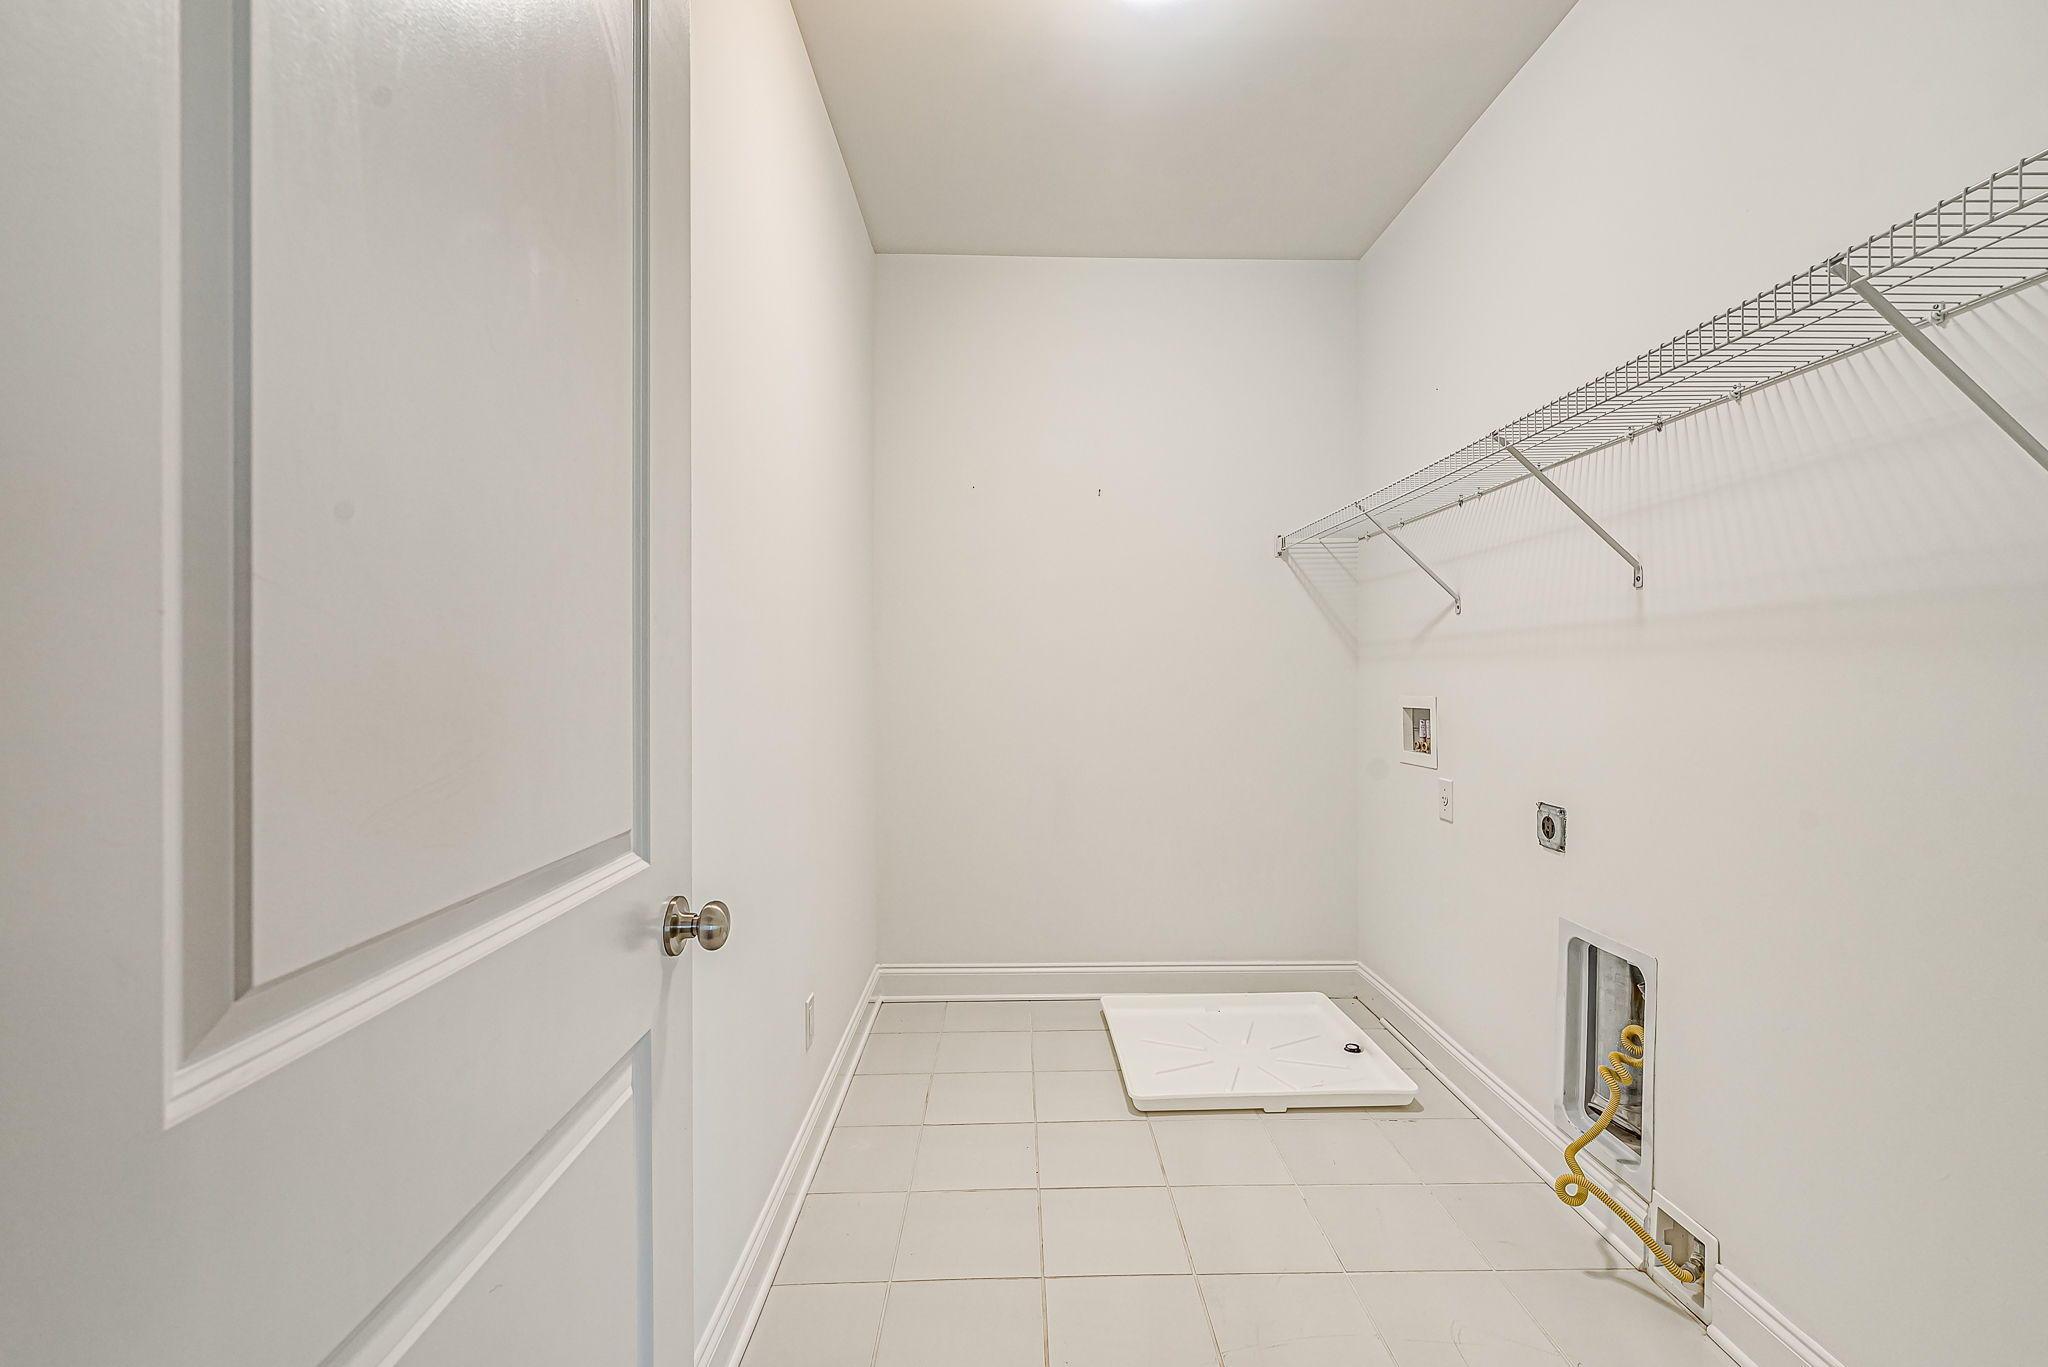 Dunes West Homes For Sale - 2476 Kings Gate, Mount Pleasant, SC - 34